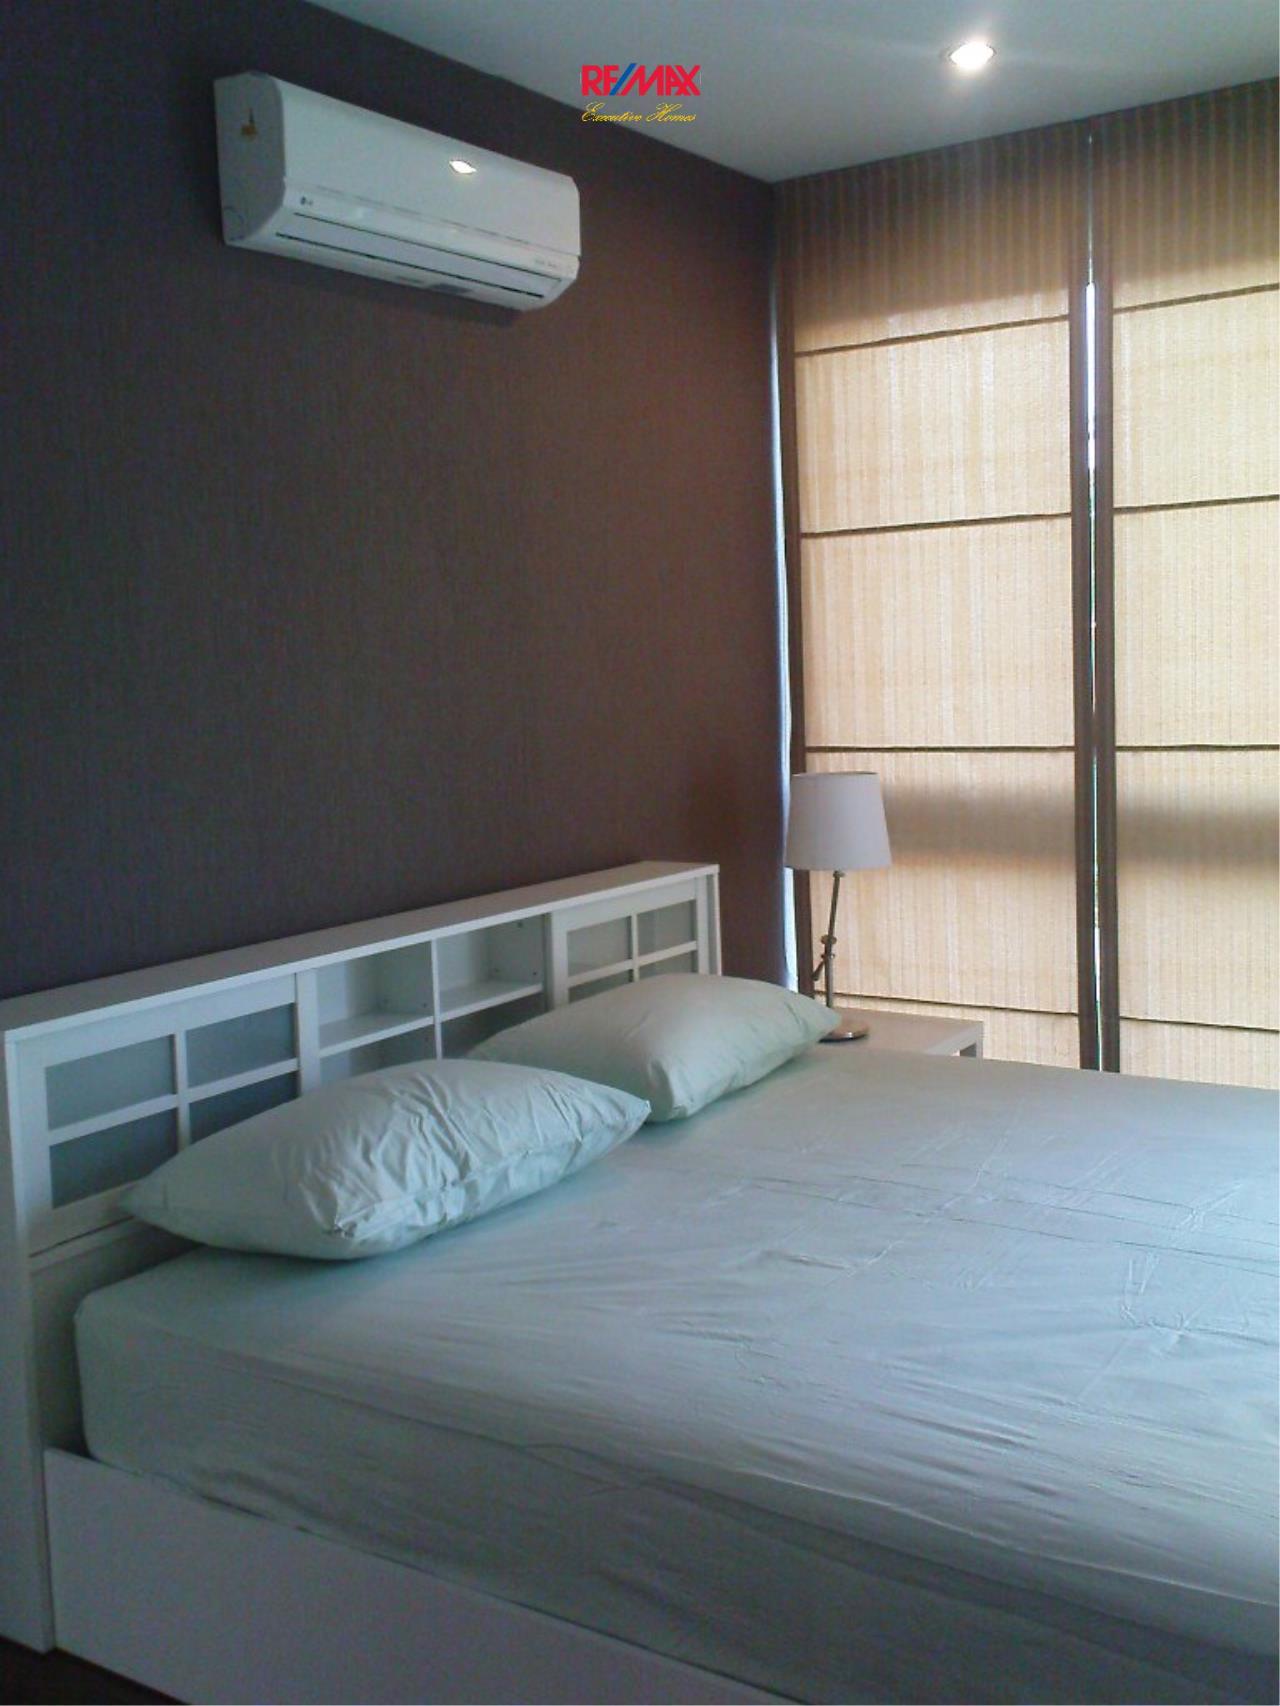 RE/MAX Executive Homes Agency's Spacious 1 Bedroom for Rent Von Napa Sukhumvit 38 2